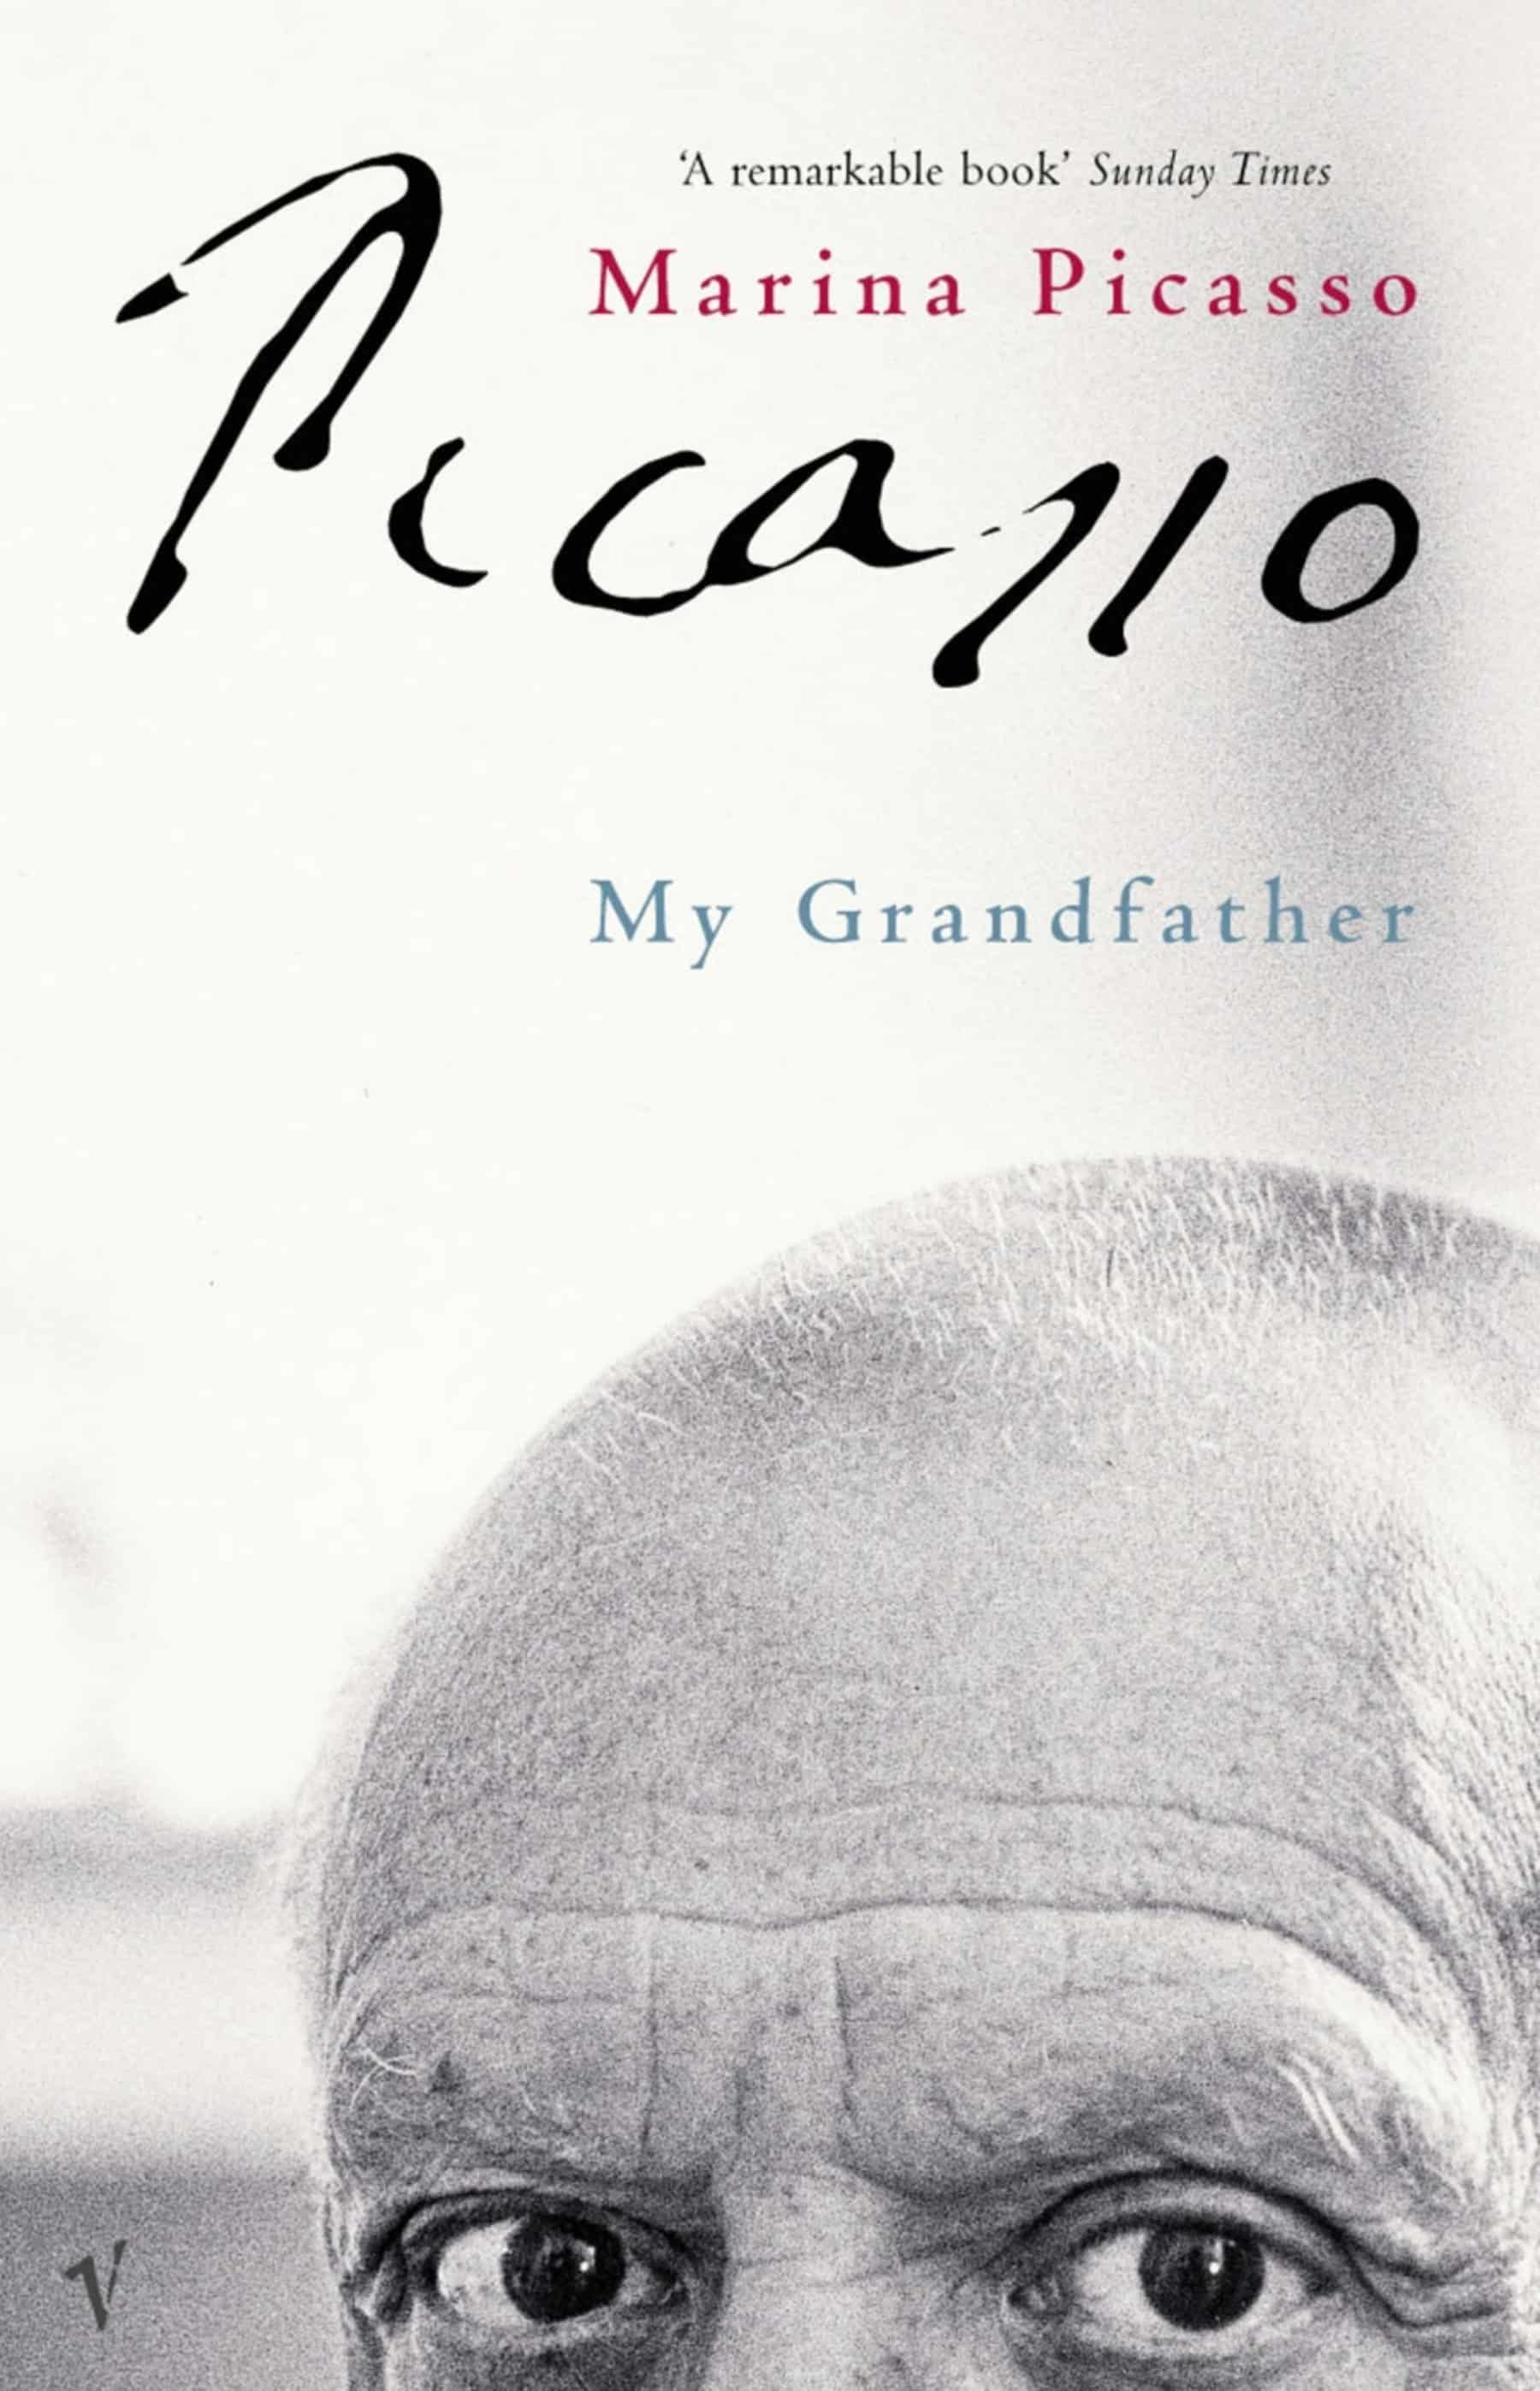 Picasso My Grandfather v2 - Picasso, My Grandfather